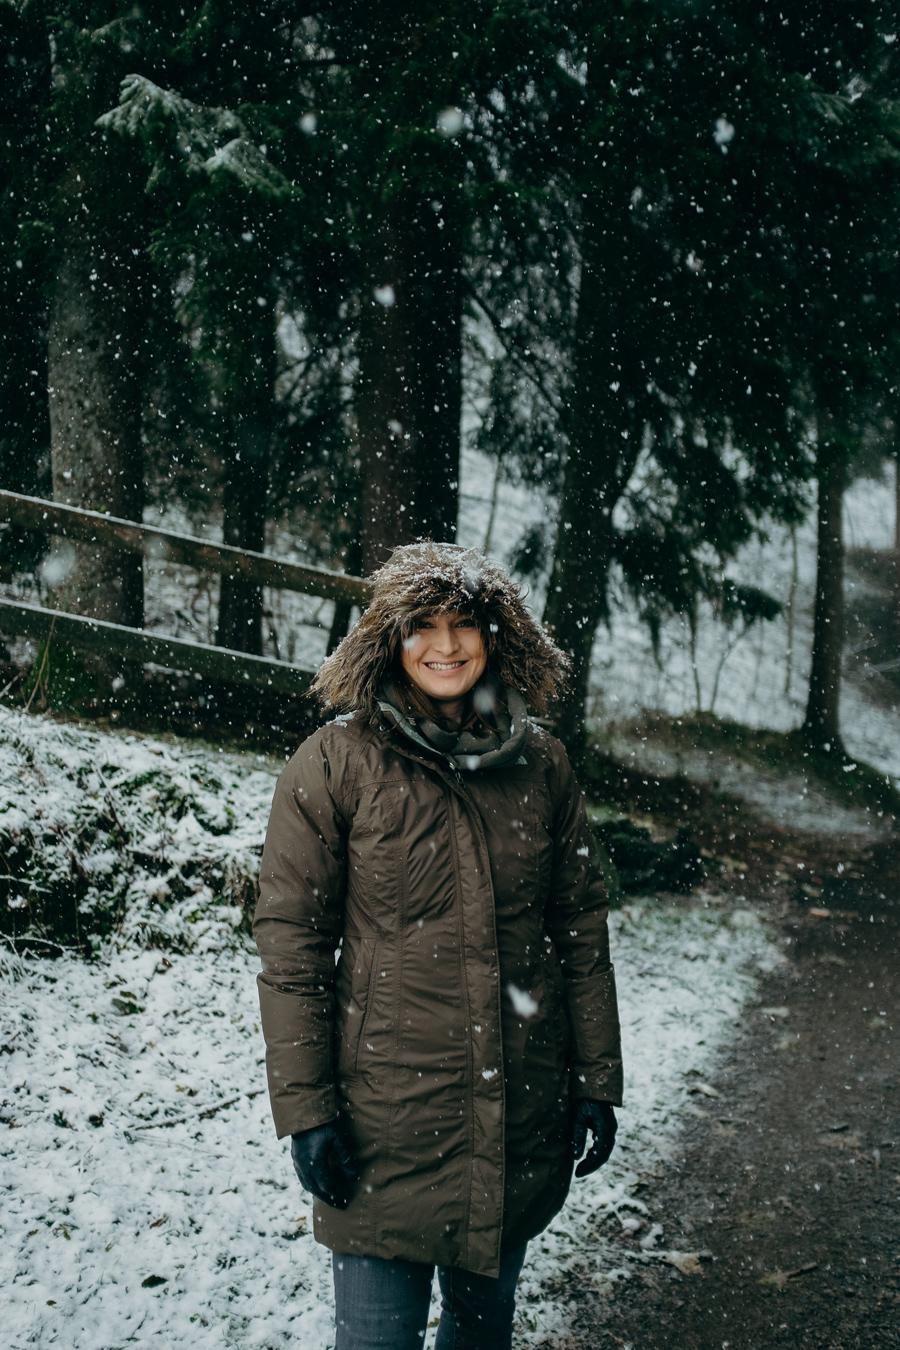 049-switzerland-mountains-snow-travel-photography.jpg